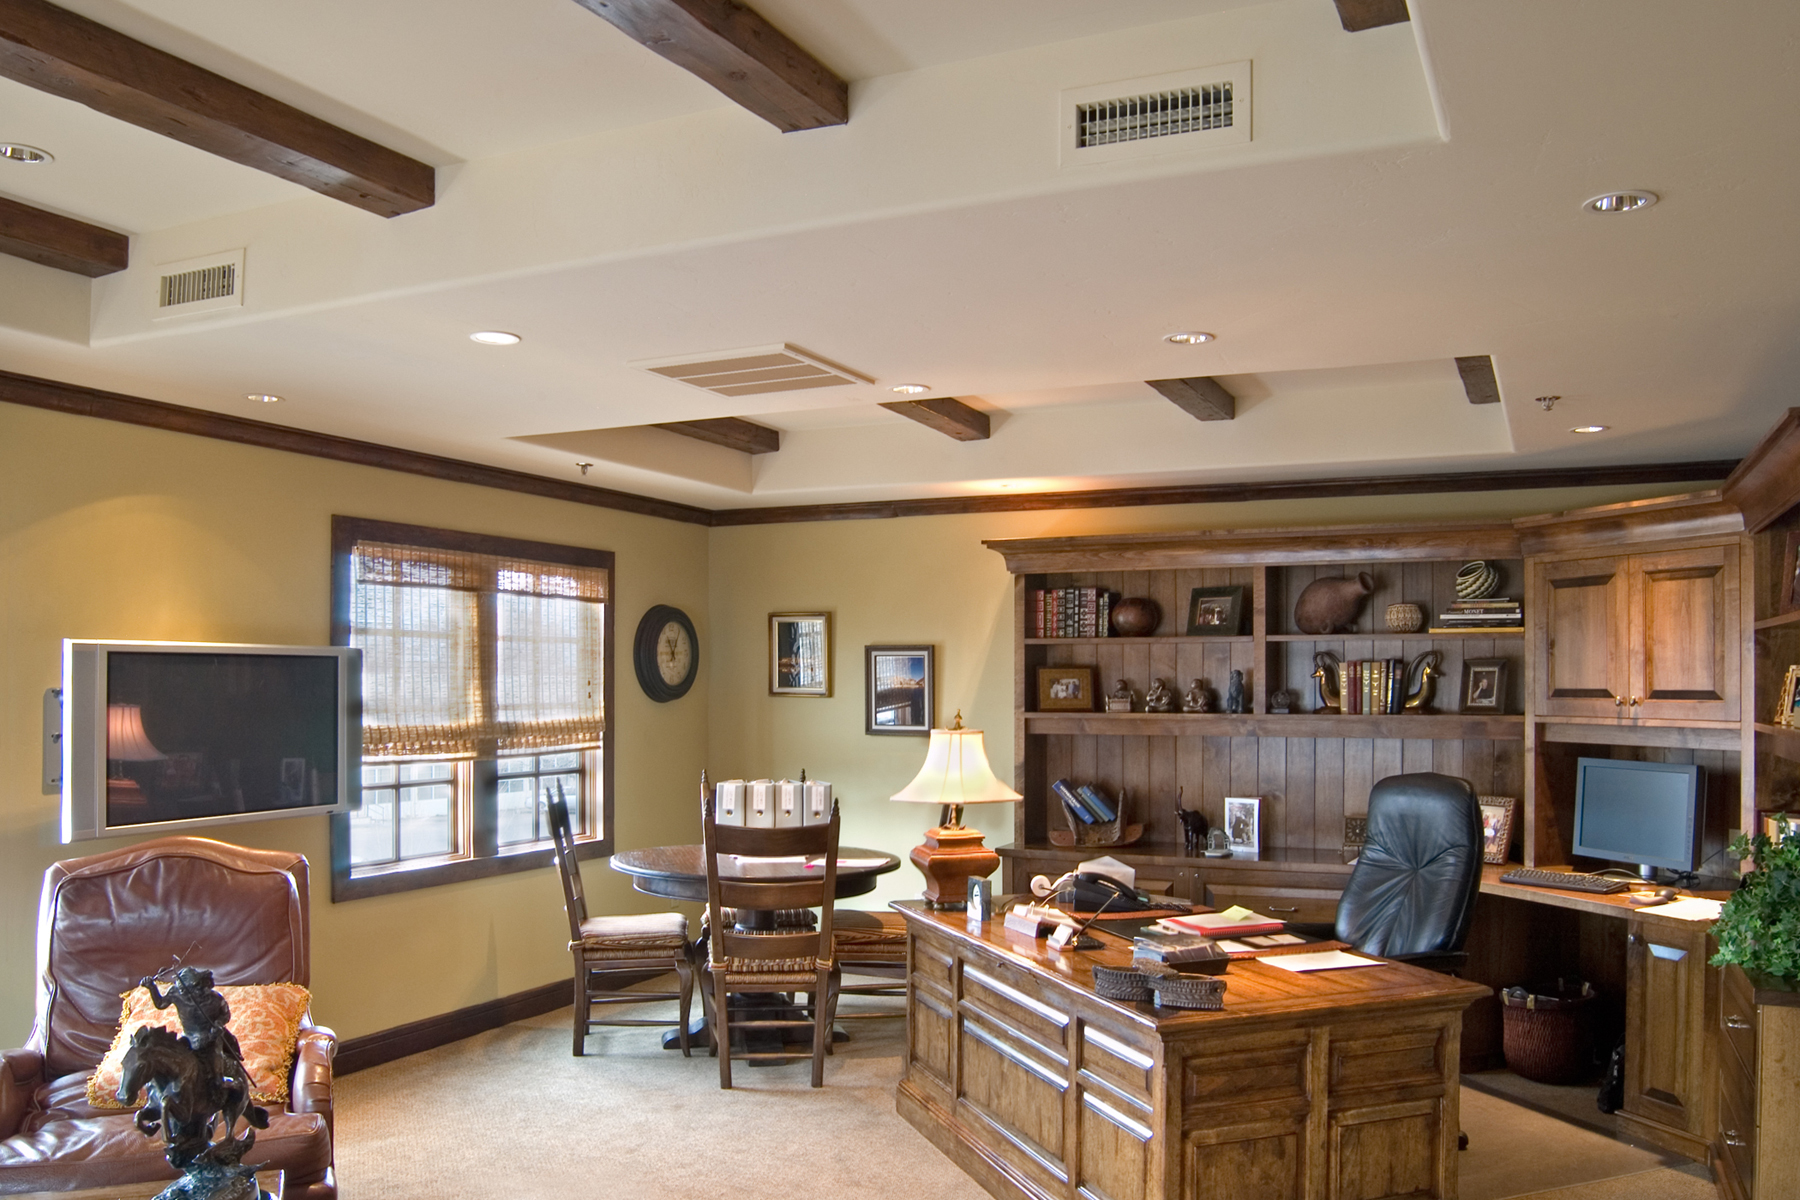 100 North Guadalupe - Suite 201 (B)